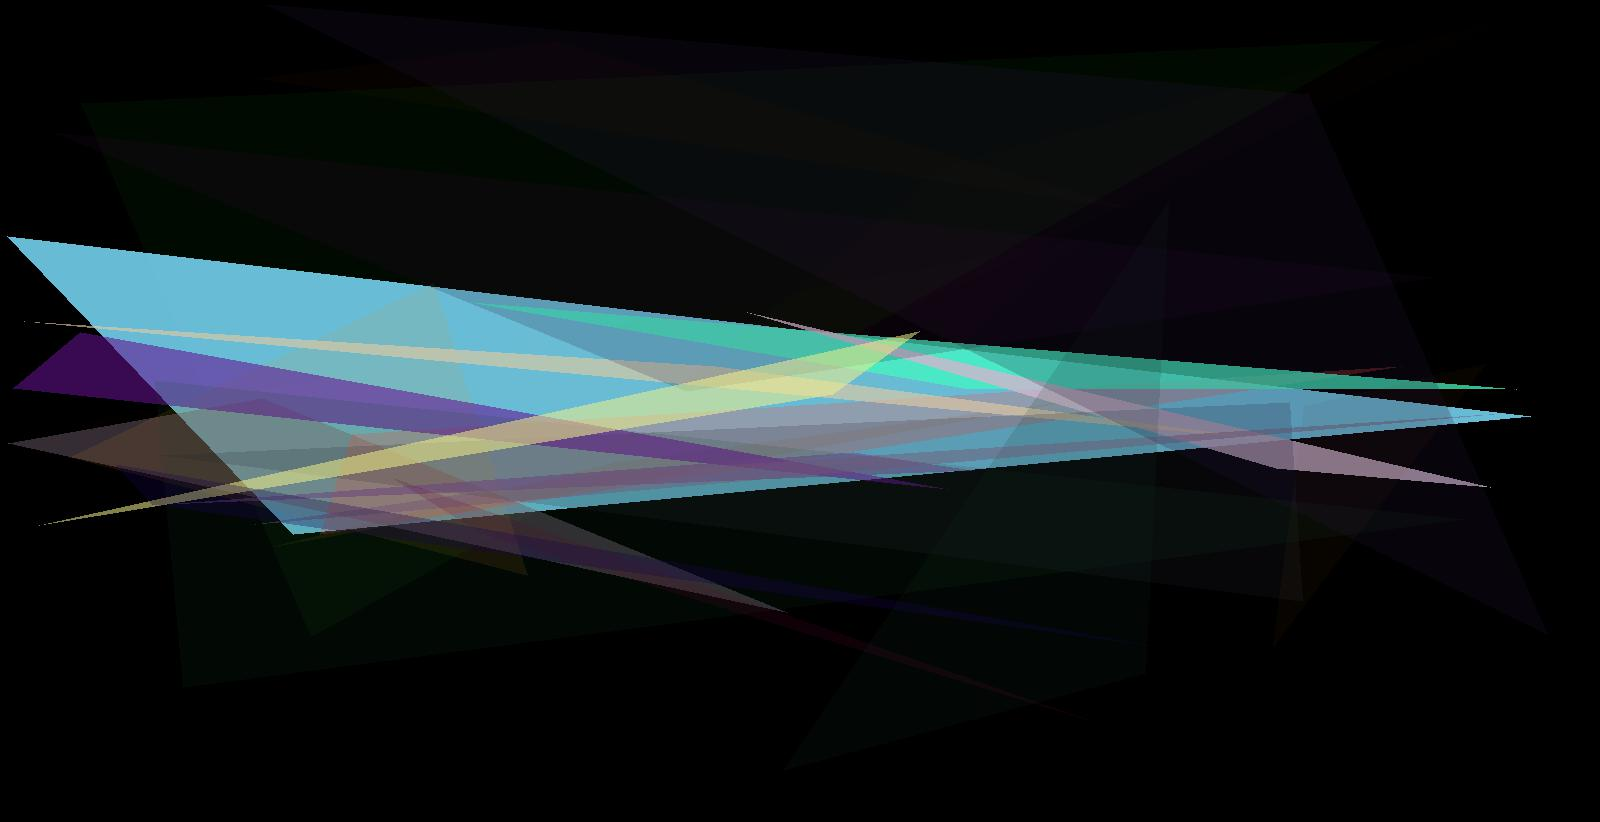 generation 1272-92.492119_per_cent-25_brush_strokes.jpg